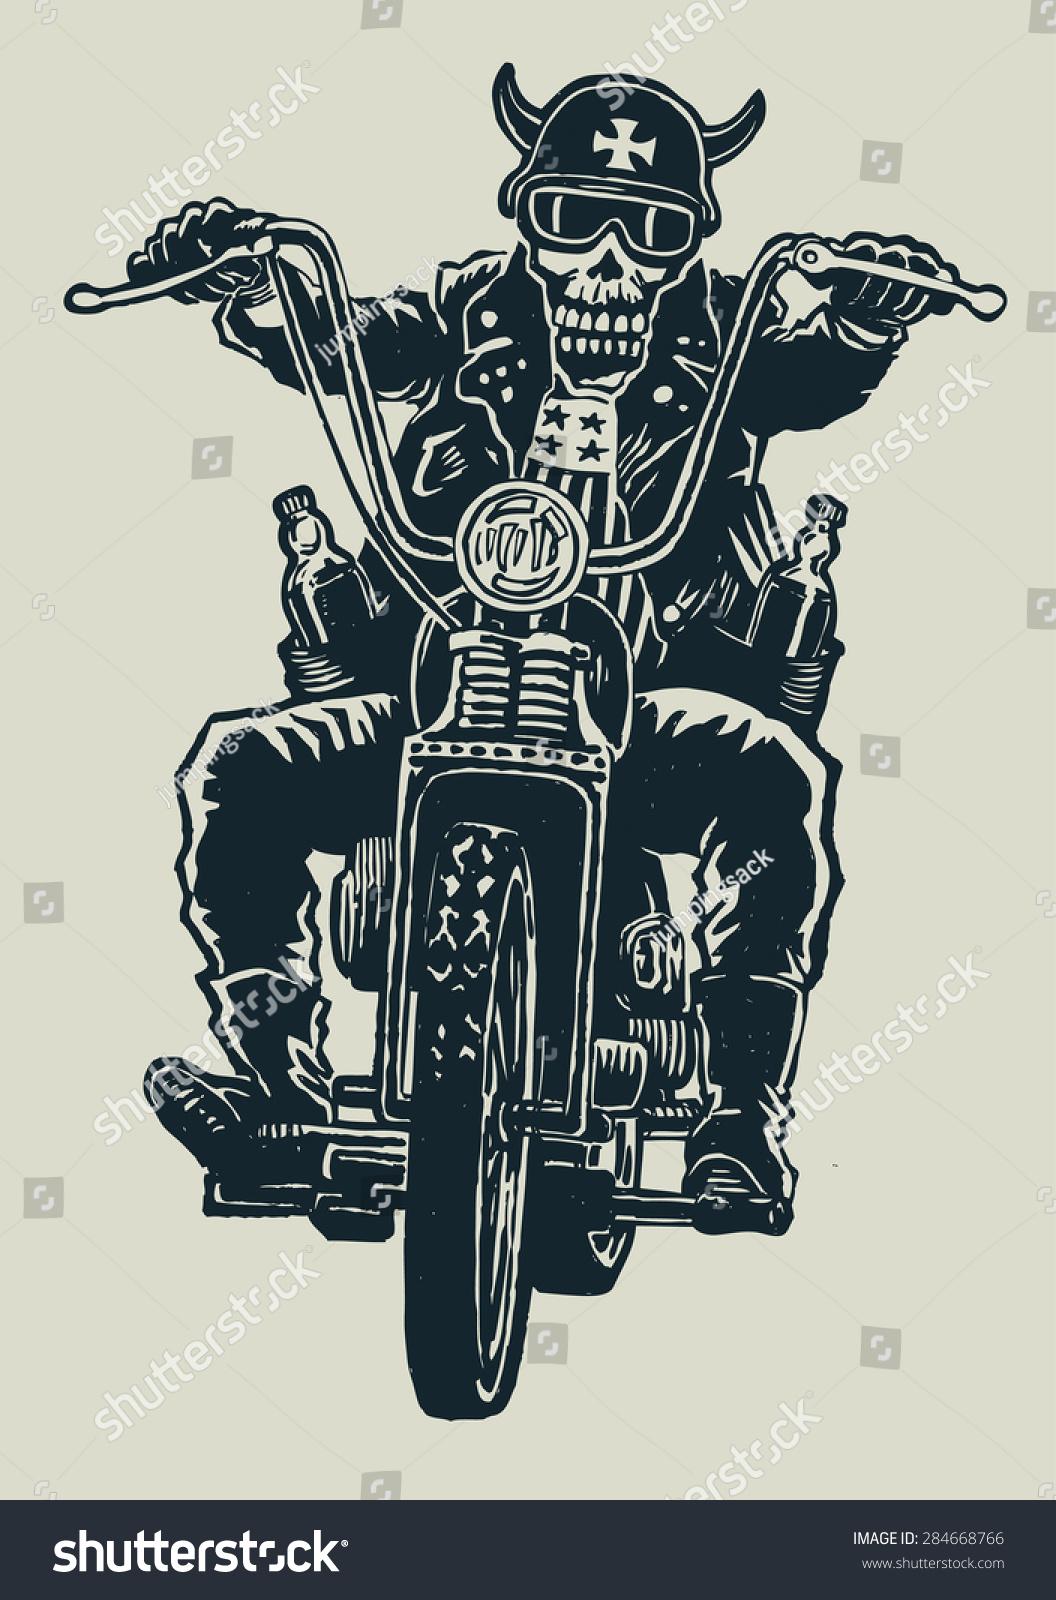 Crazy biker skull motorcycle glasses helmet stock vector 284668766 crazy biker skull in motorcycle glasses helmet with horns biker symbol engraving style biocorpaavc